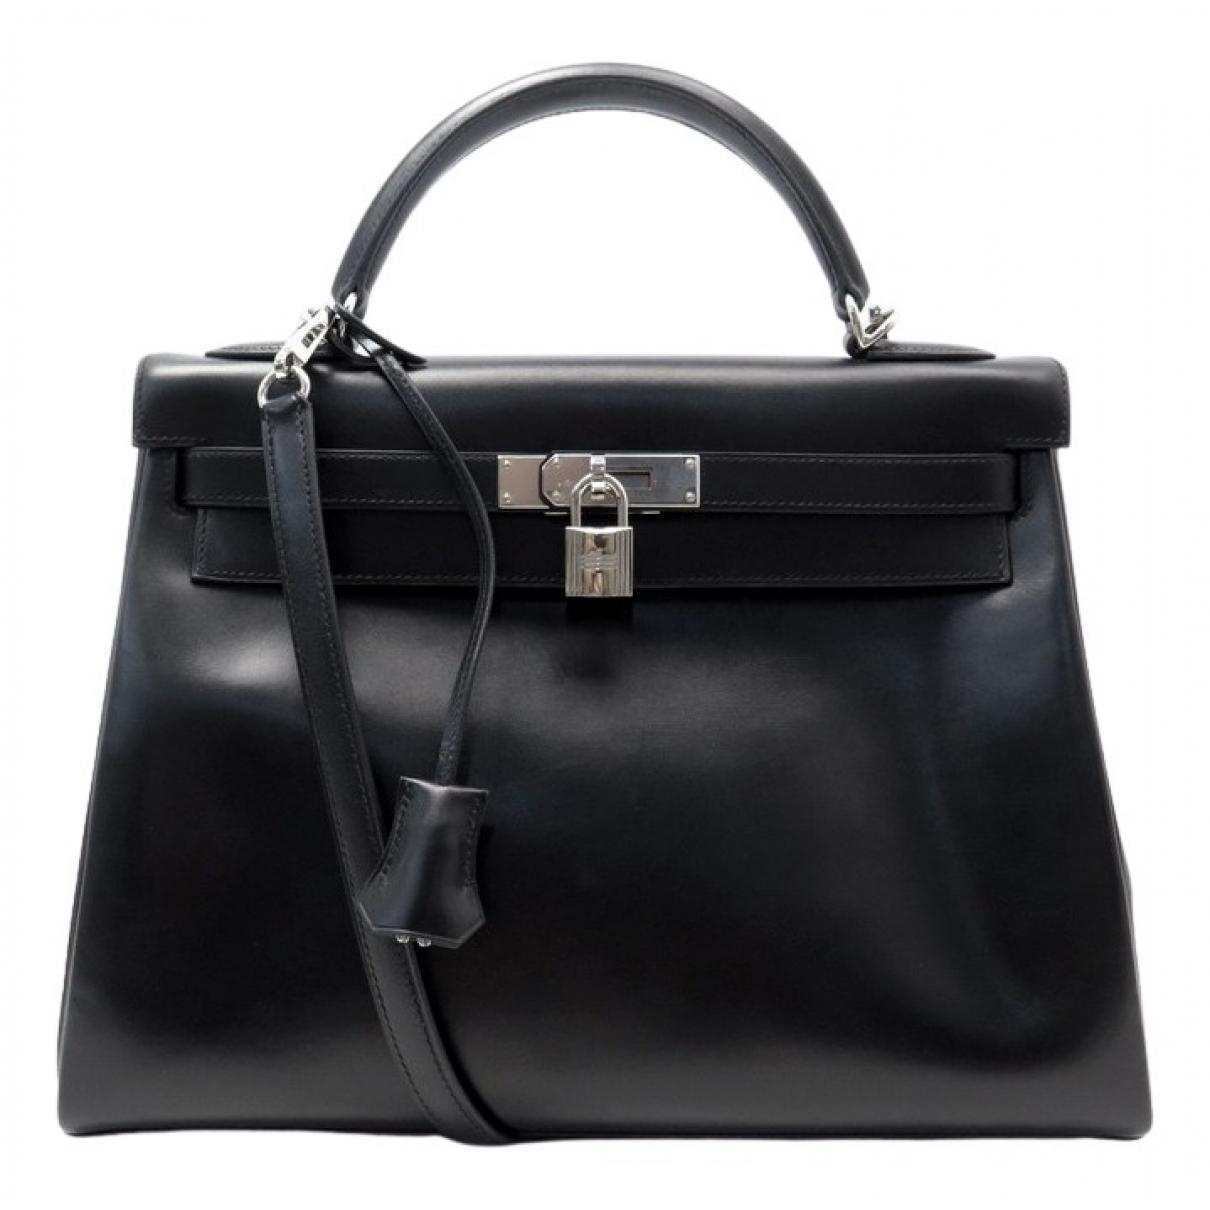 Hermès Kelly 32 Black Leather handbag for Women N